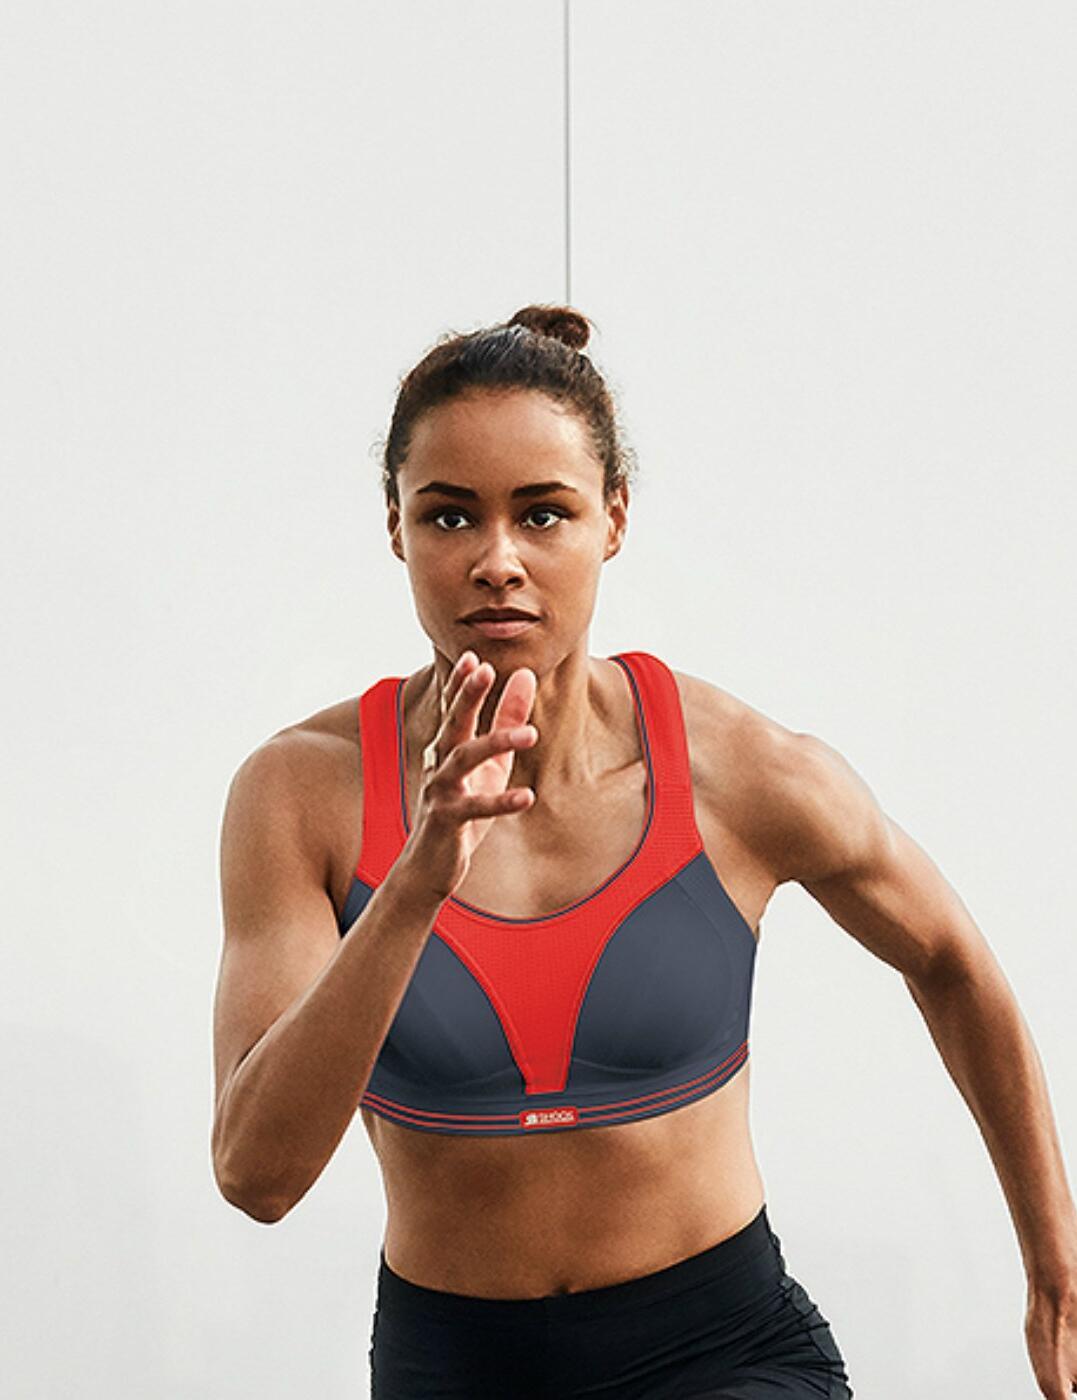 Shock-Absorber-High-Impact-Run-Sports-Bra-S5044-Womens-Running-Sports-Bras thumbnail 12